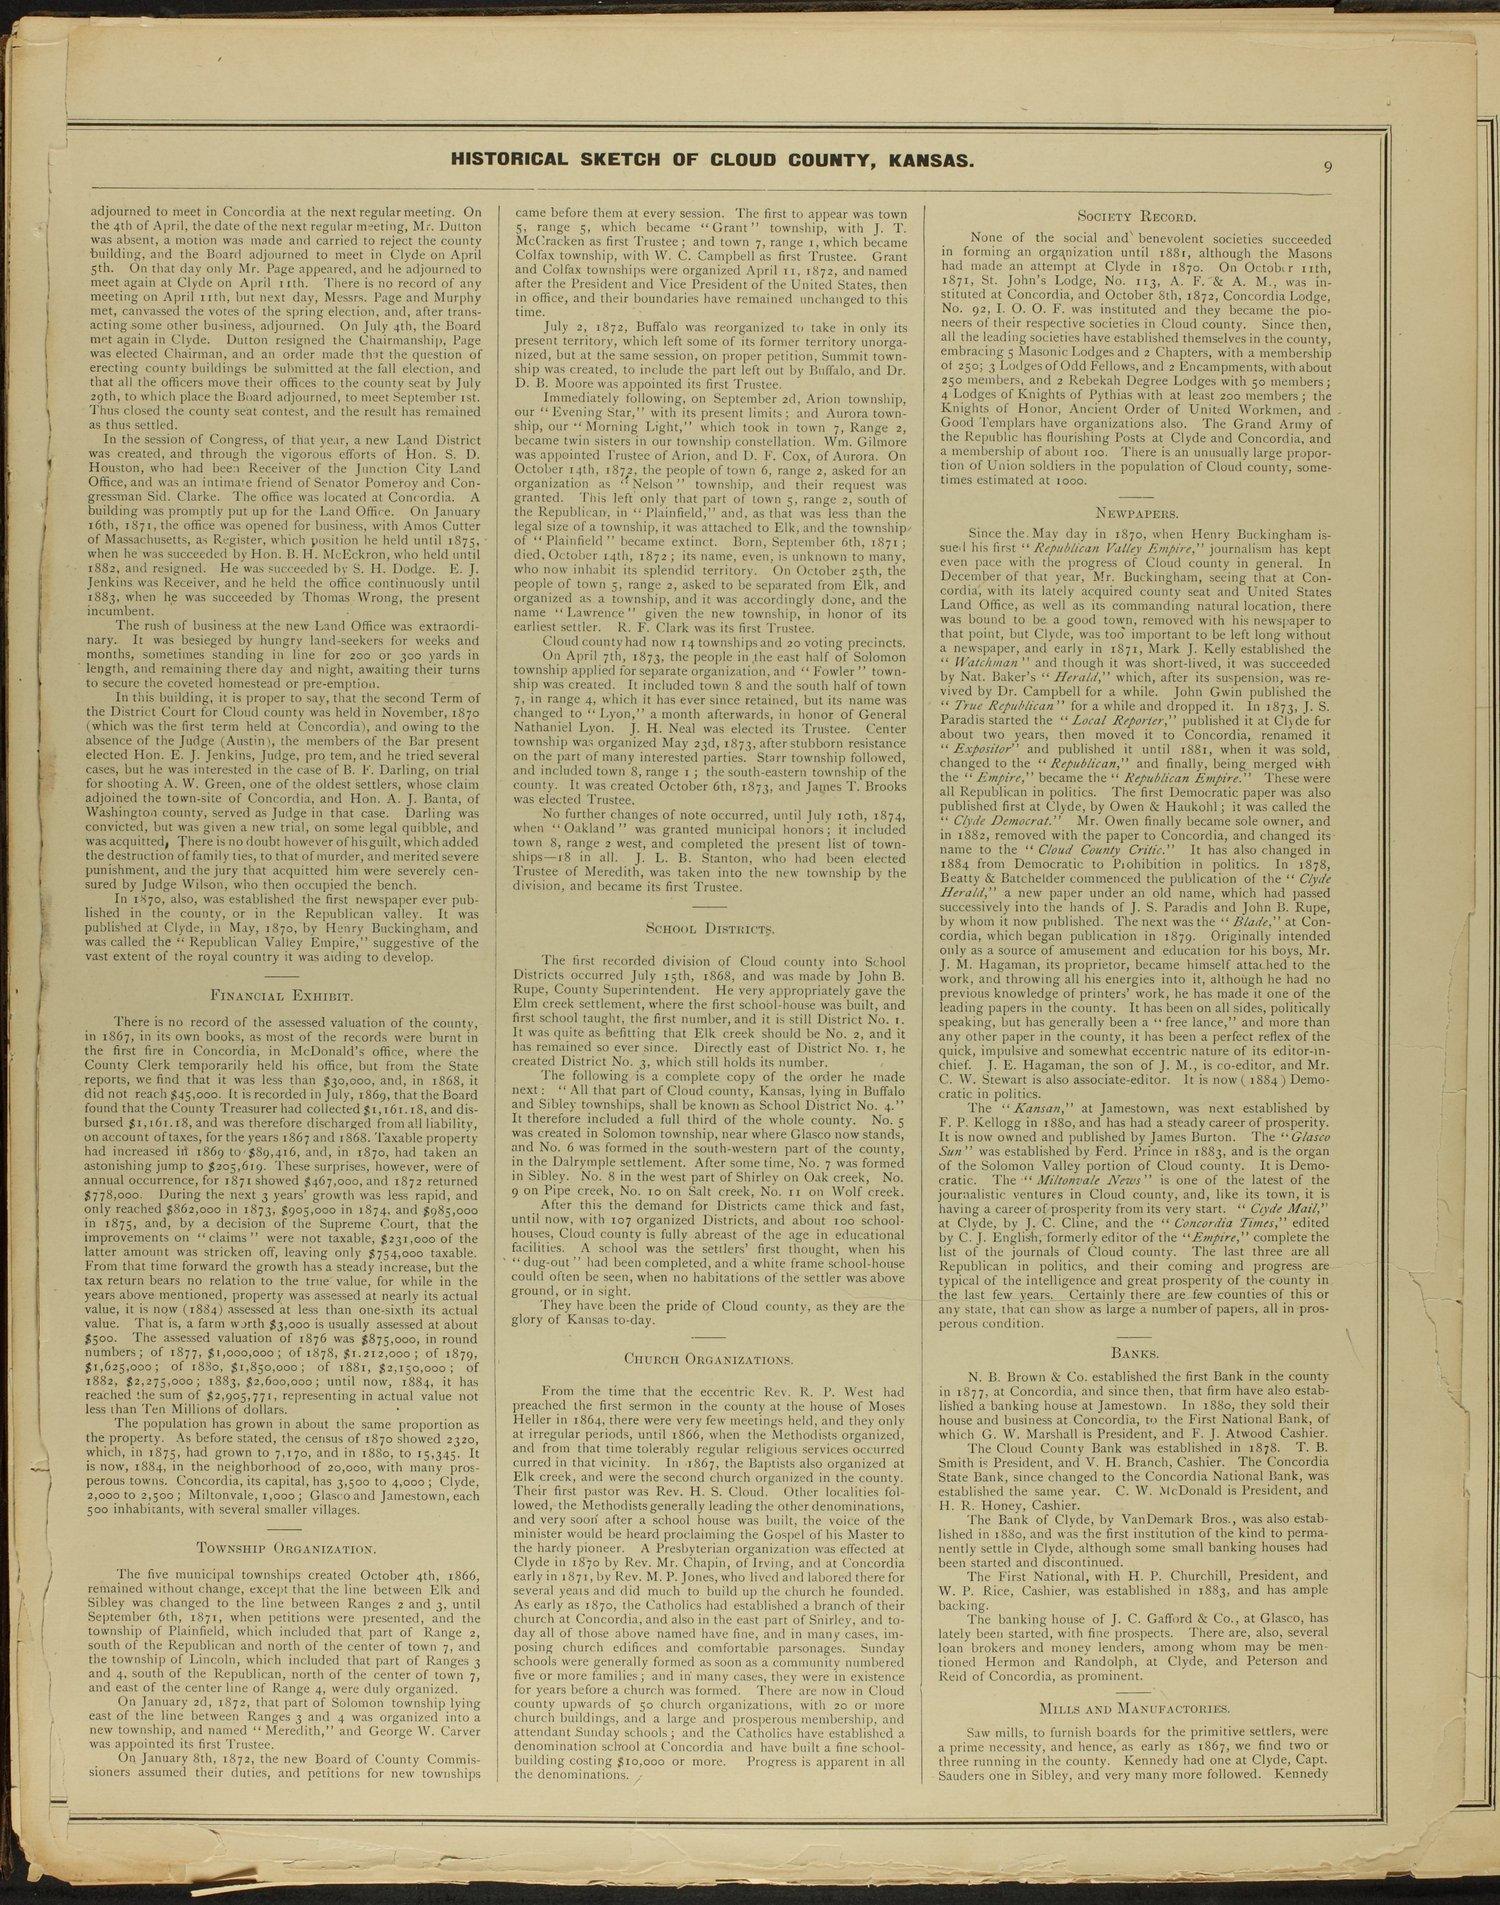 Edward's atlas of Cloud County, Kansas - 9